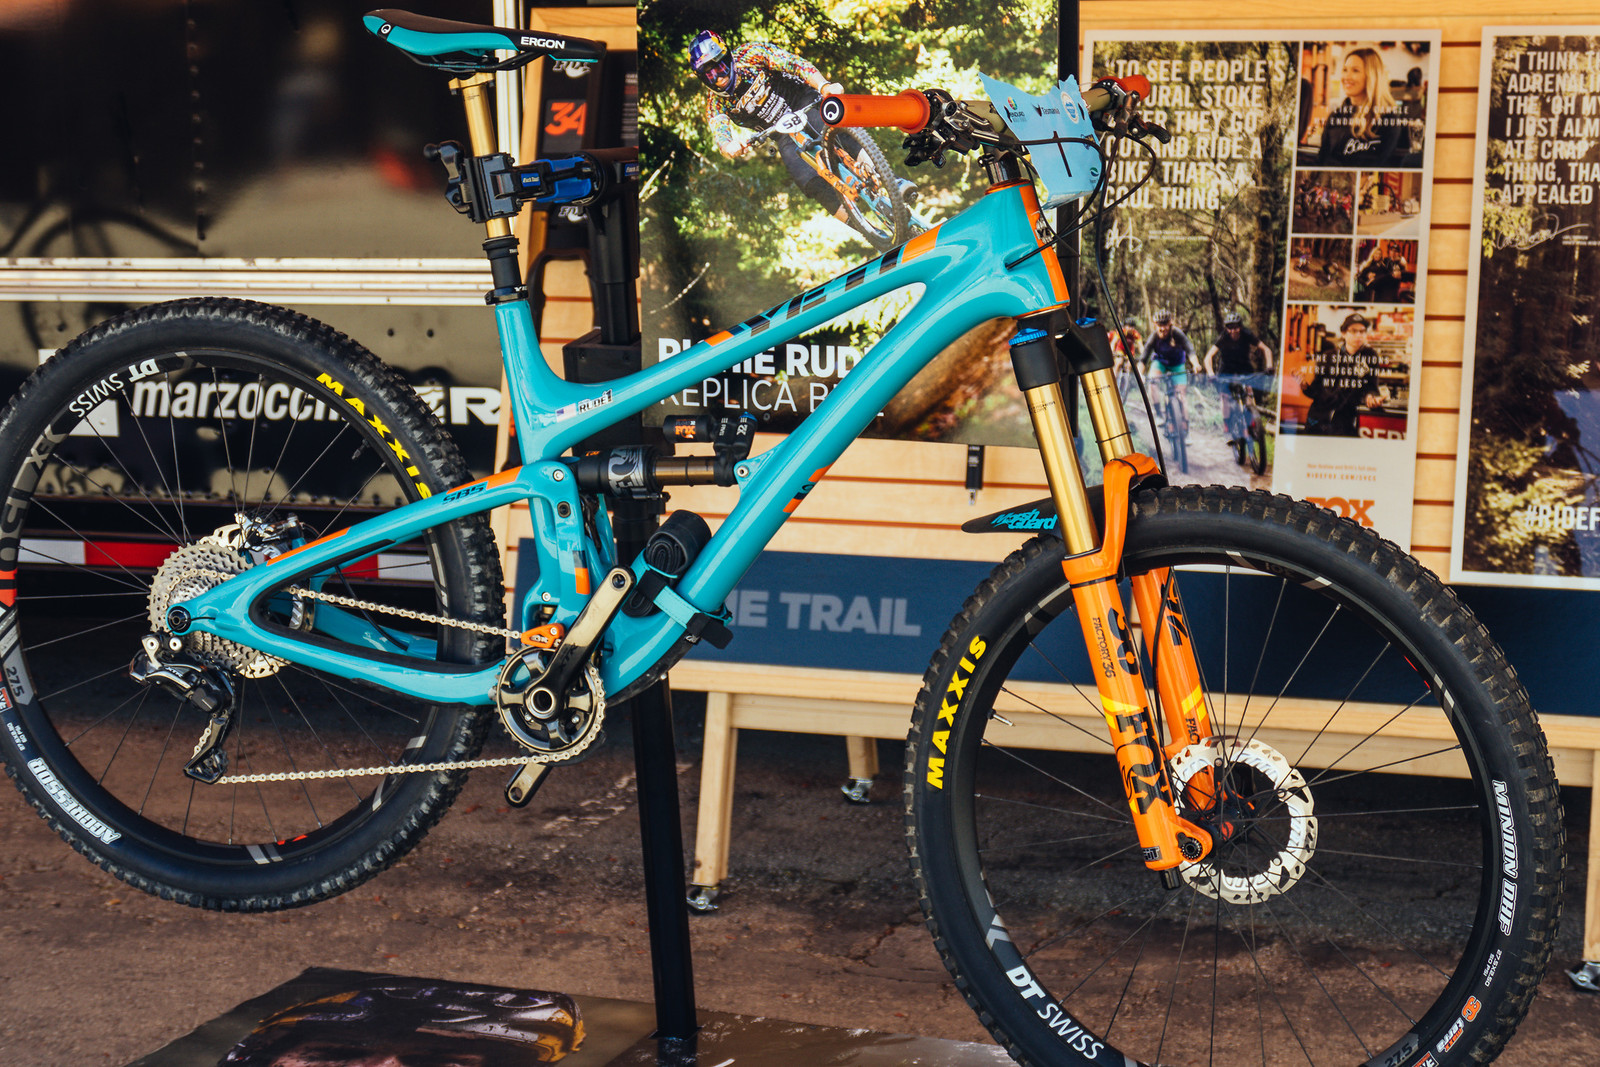 Replica Richie Rude Yeti SB5 EWS Race Bike - FredLikesTrikes - Mountain Biking Pictures - Vital MTB